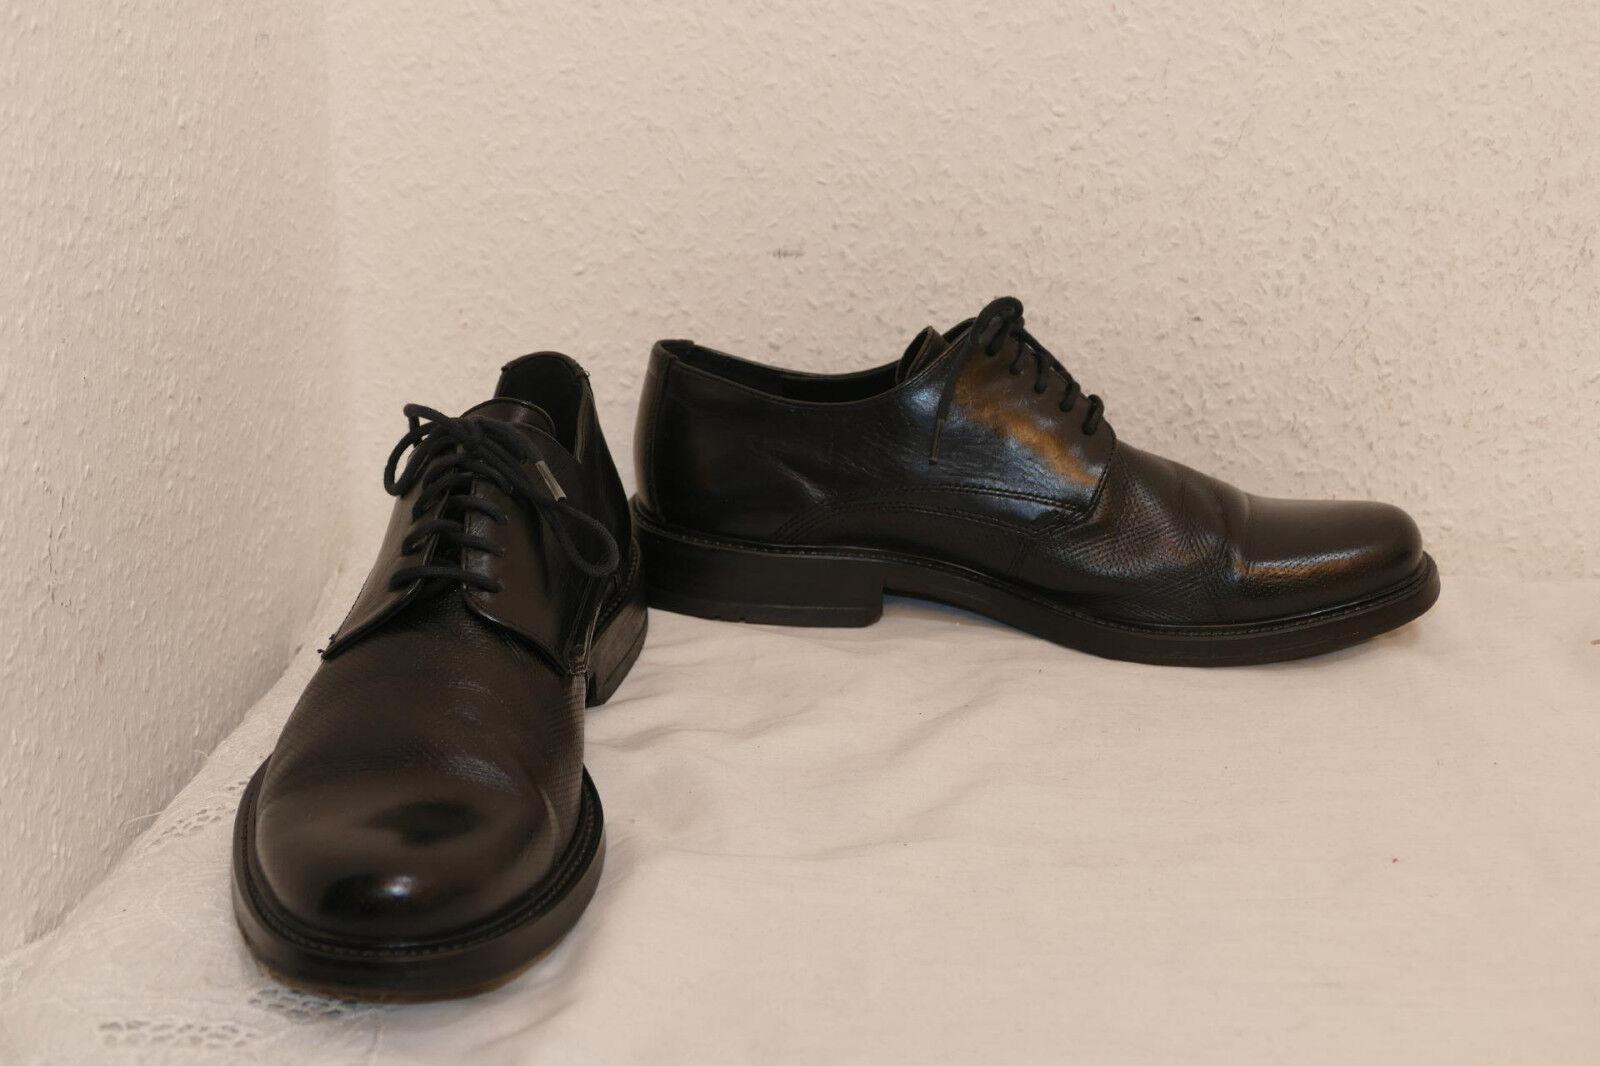 749---Lloyd Graziano UK 9  43 Gr 43   neuwertig  Lederschnürer Business elegant c6b598